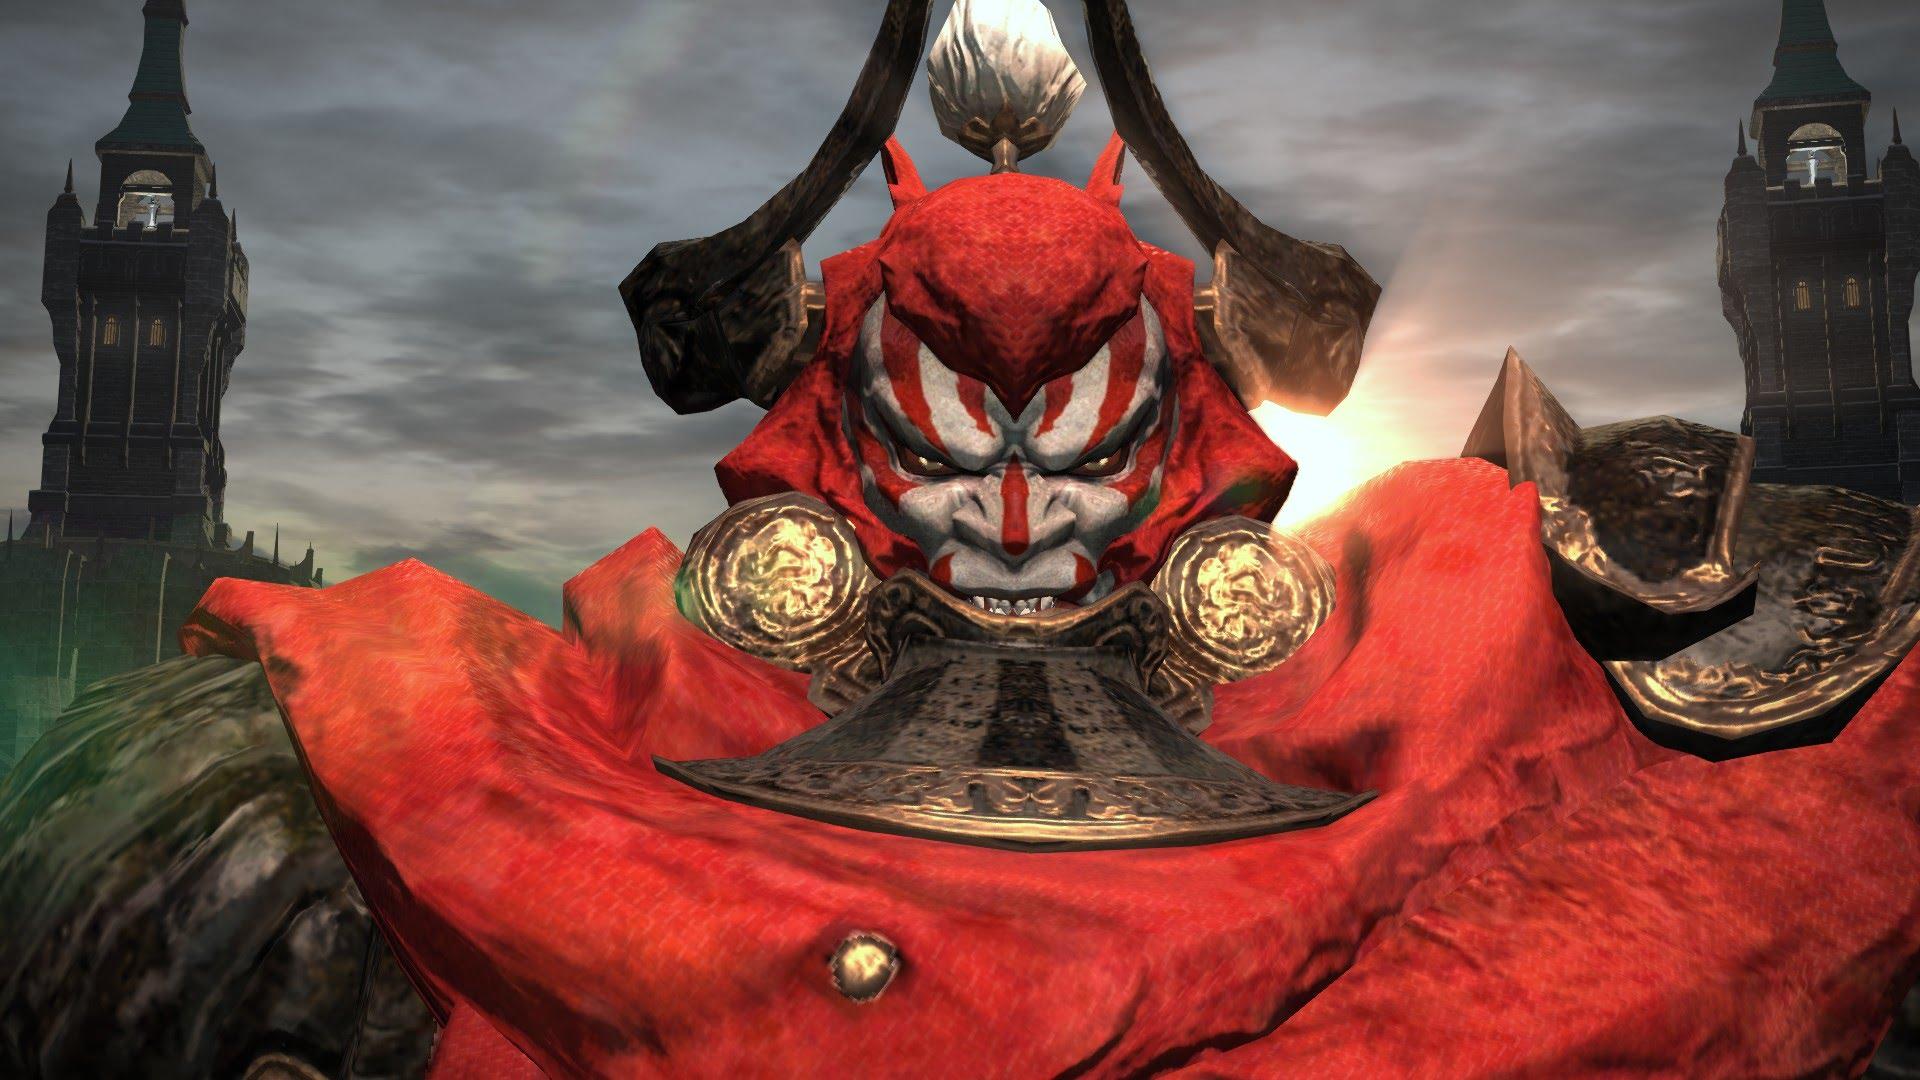 Final Fantasy XVs First Paid DLC Will Feature Gilgamesh